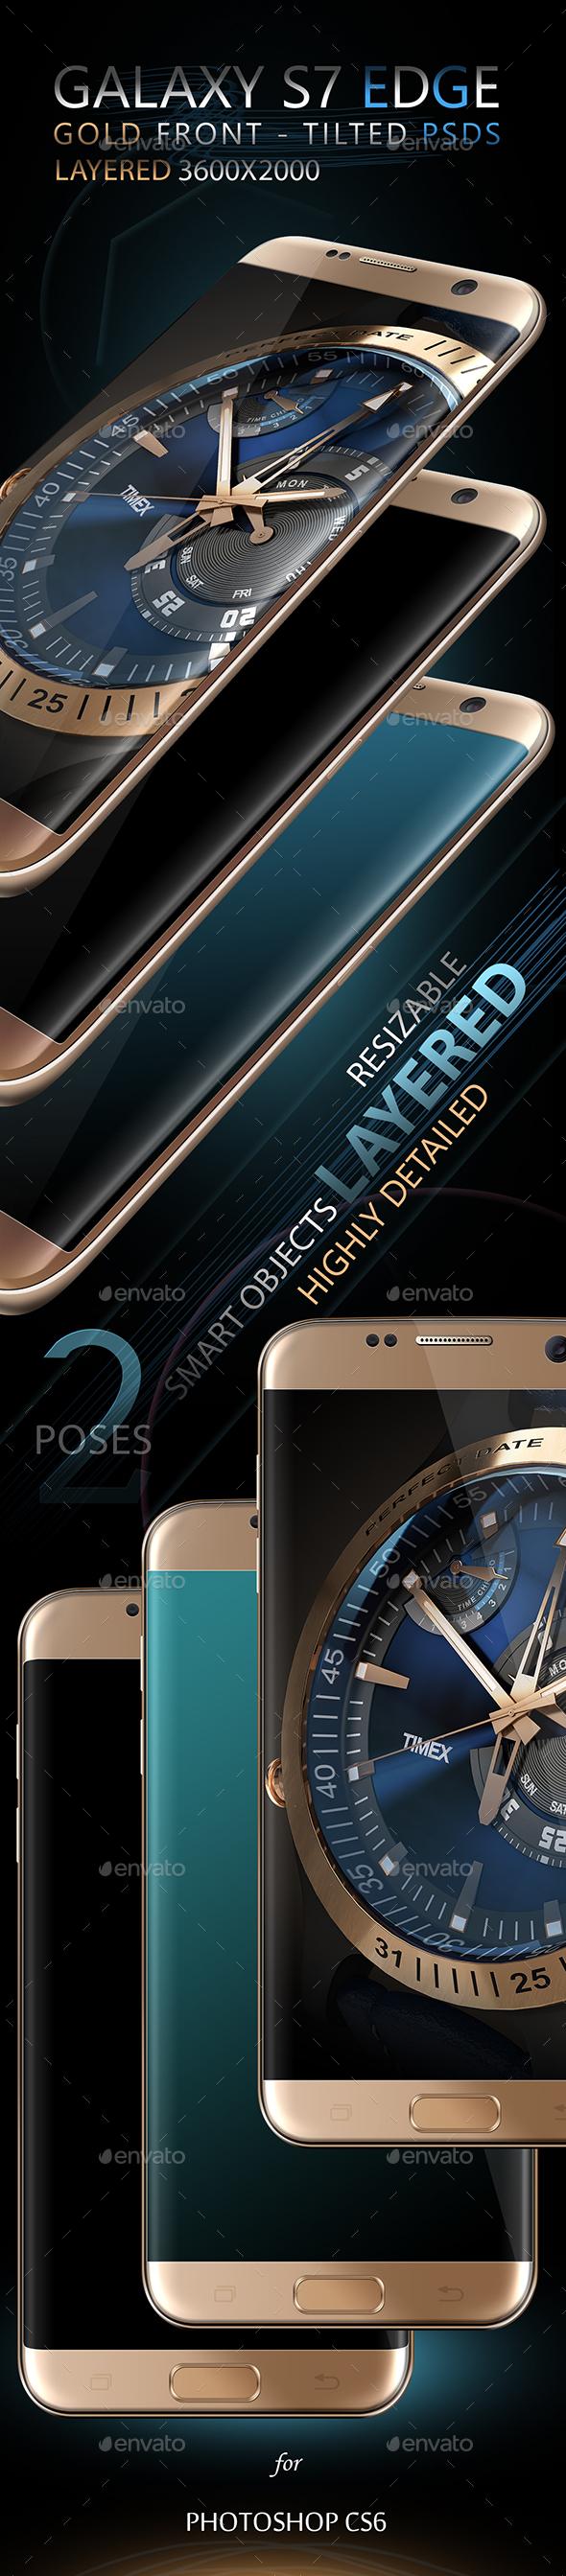 S7 Edge Mock-Ups - Mobile Displays